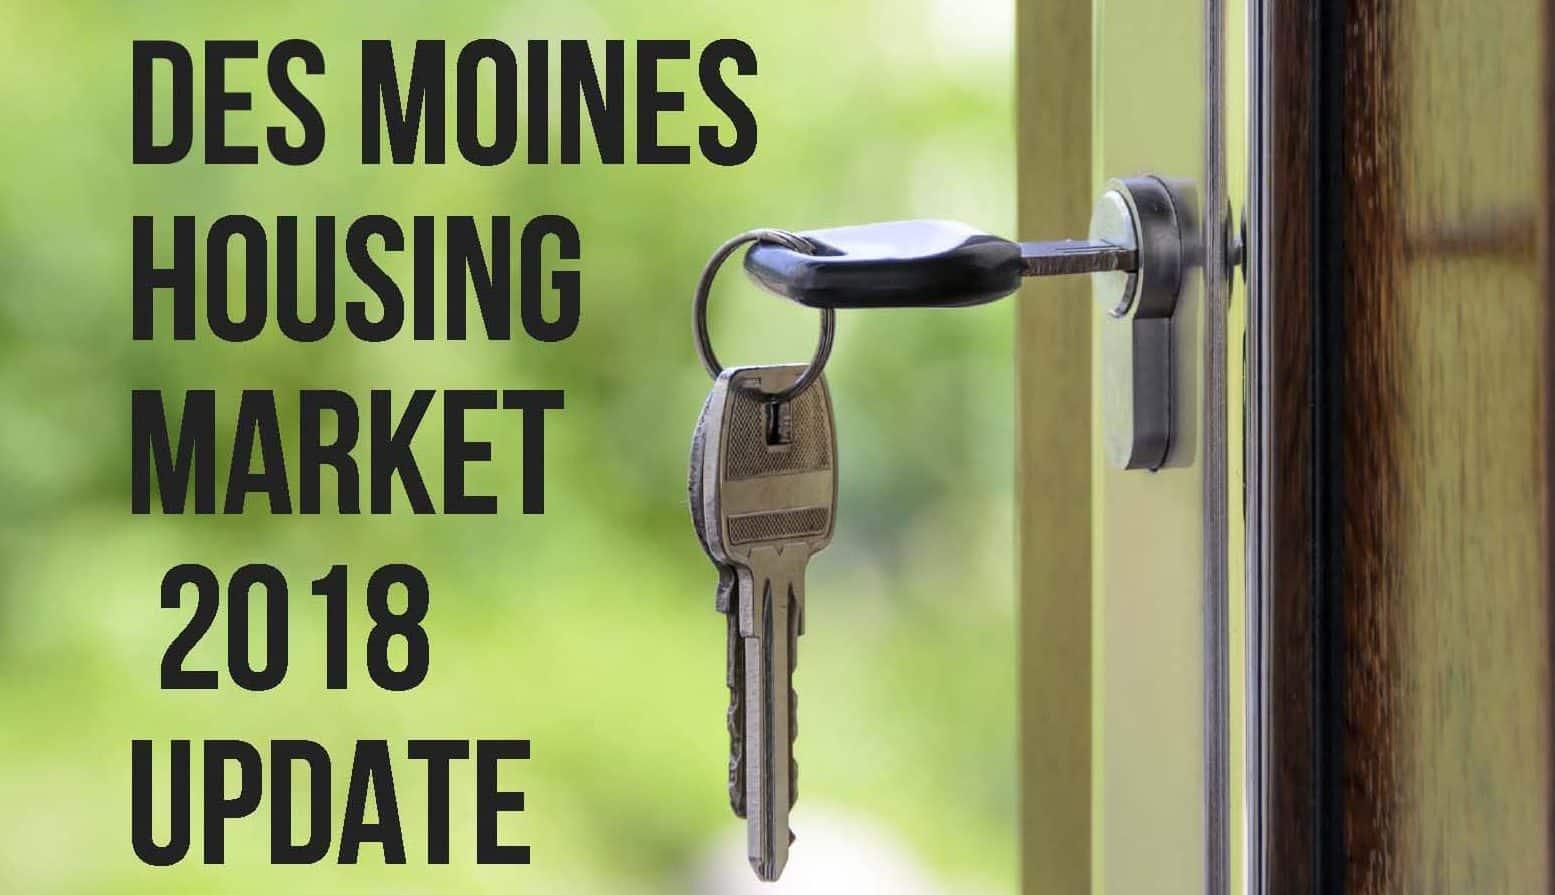 Des Moines Housing Market: 2018 Update